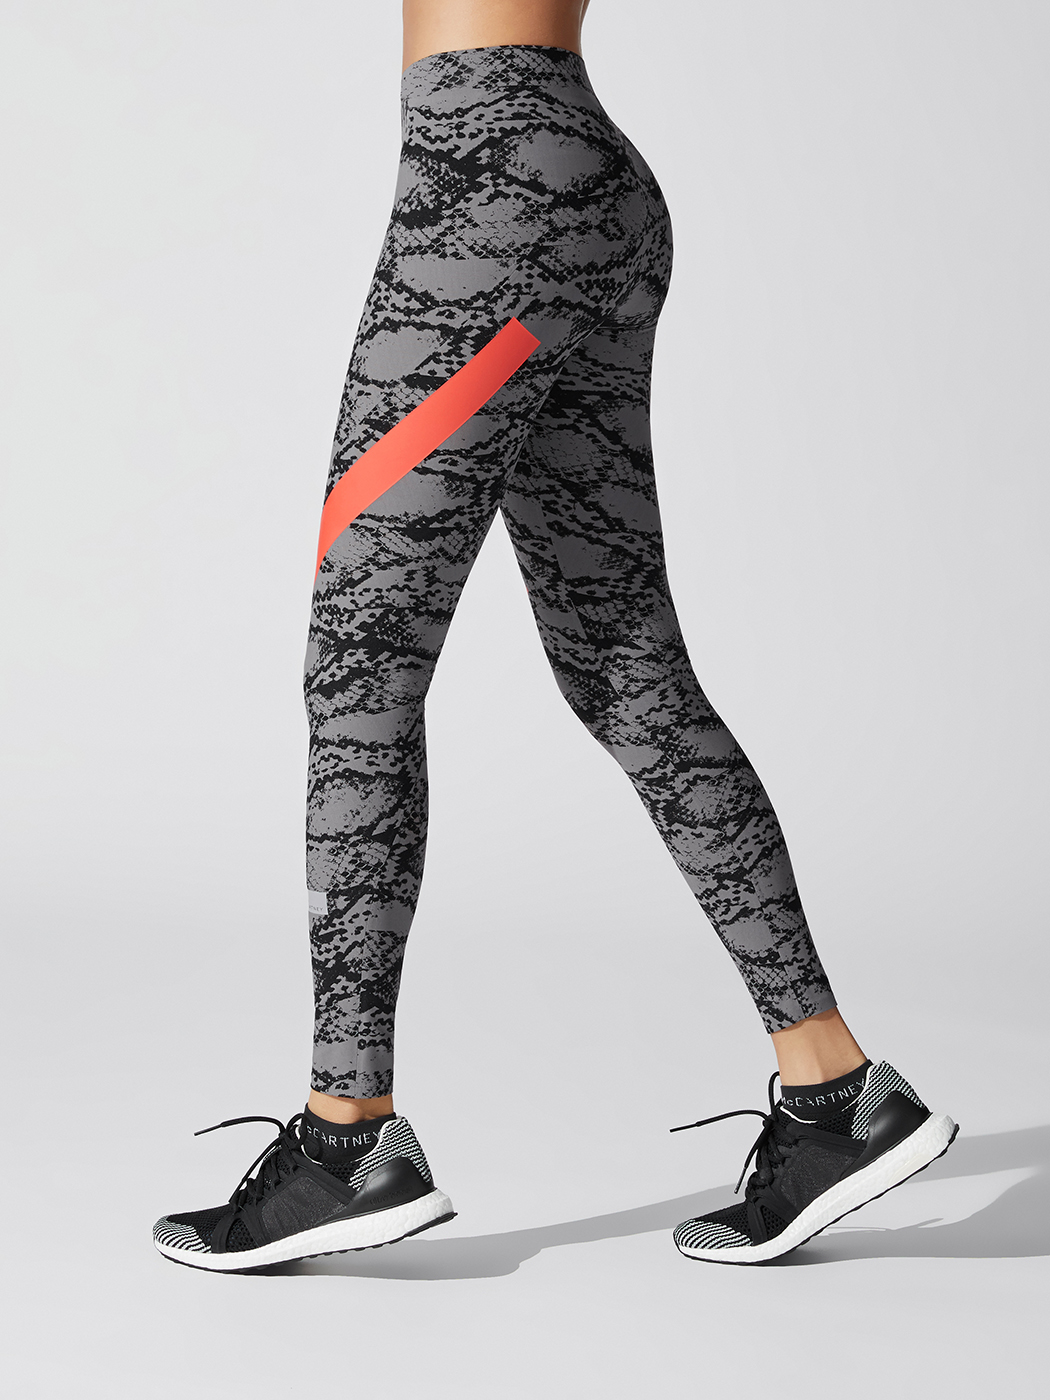 b3f1941aa6852 Adidas By Stella Mccartney ALPHASKIN TIGHT - Grey/Black - Fashion  Activewear Running